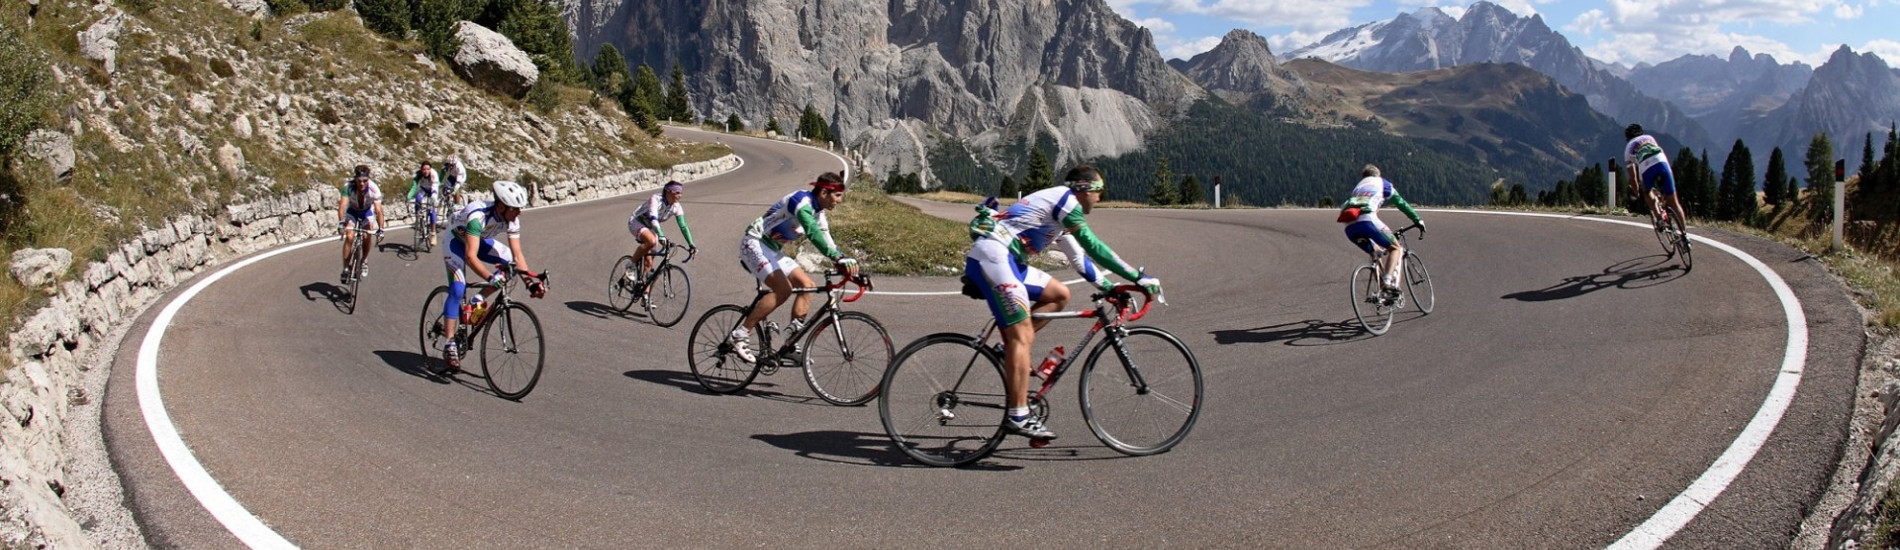 Biciclettate in Famiglia in Val di Fassa